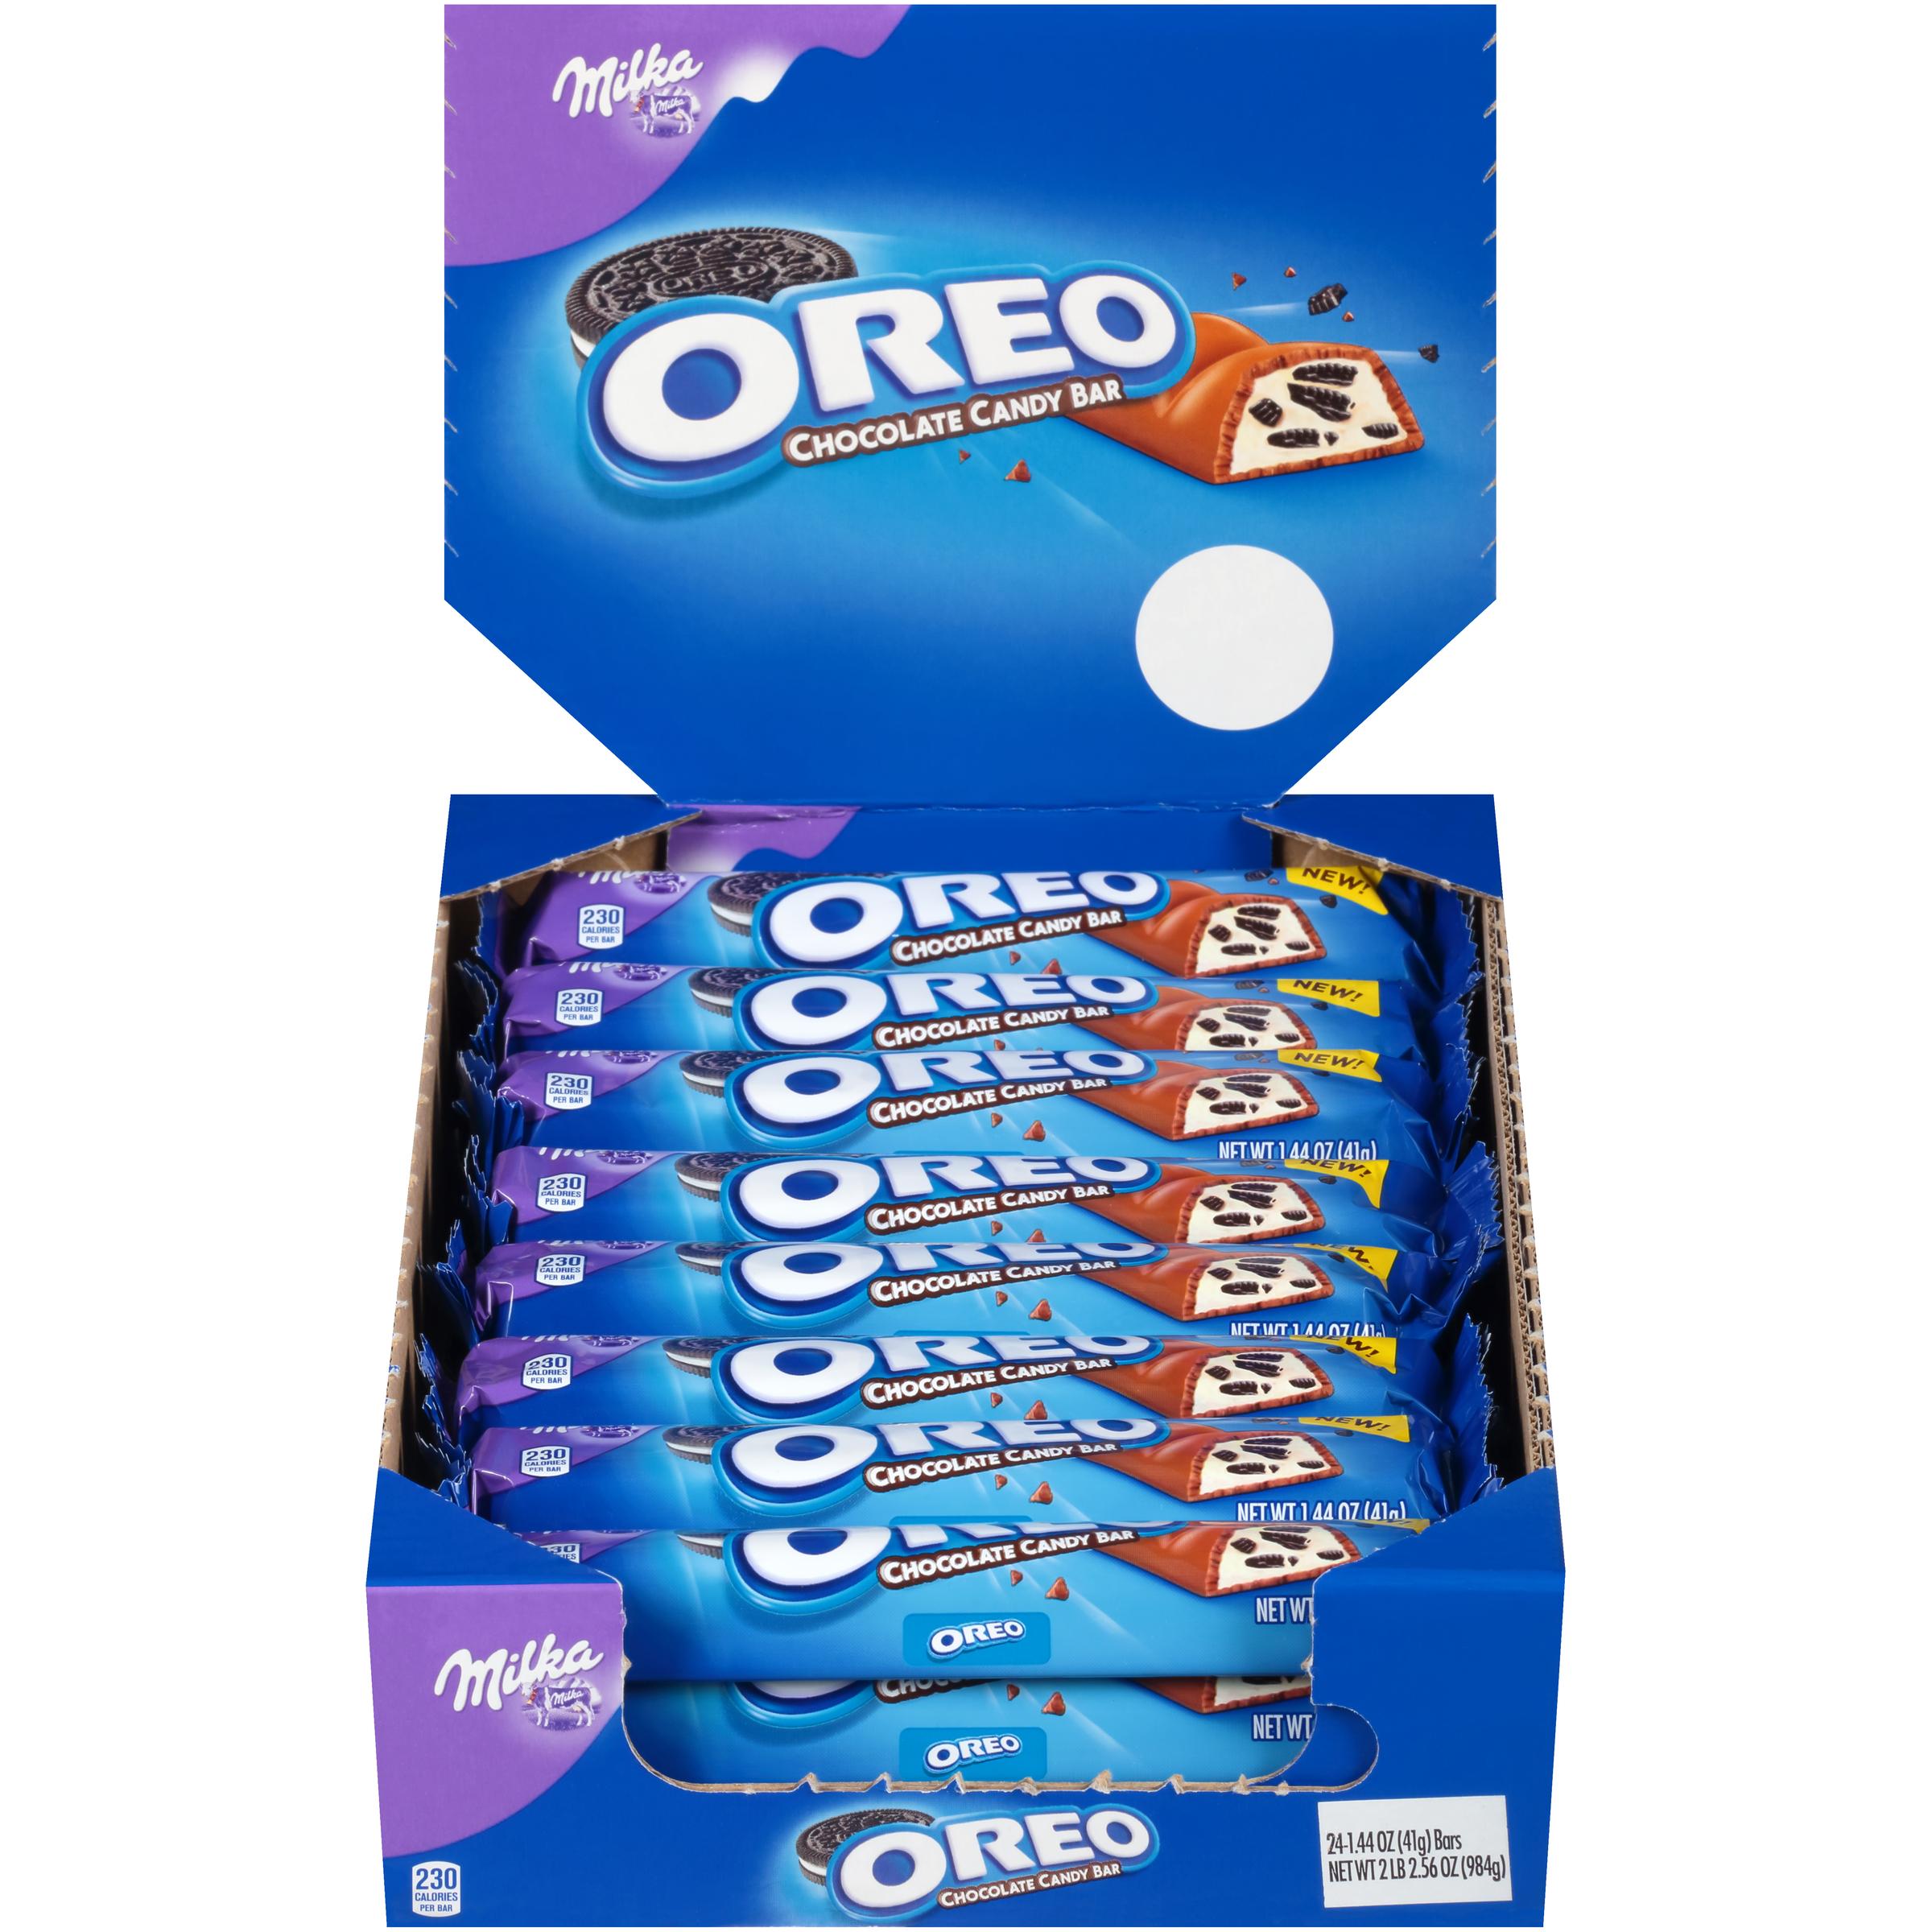 MILKA Oreo Chocolate Bar 2.16 lb